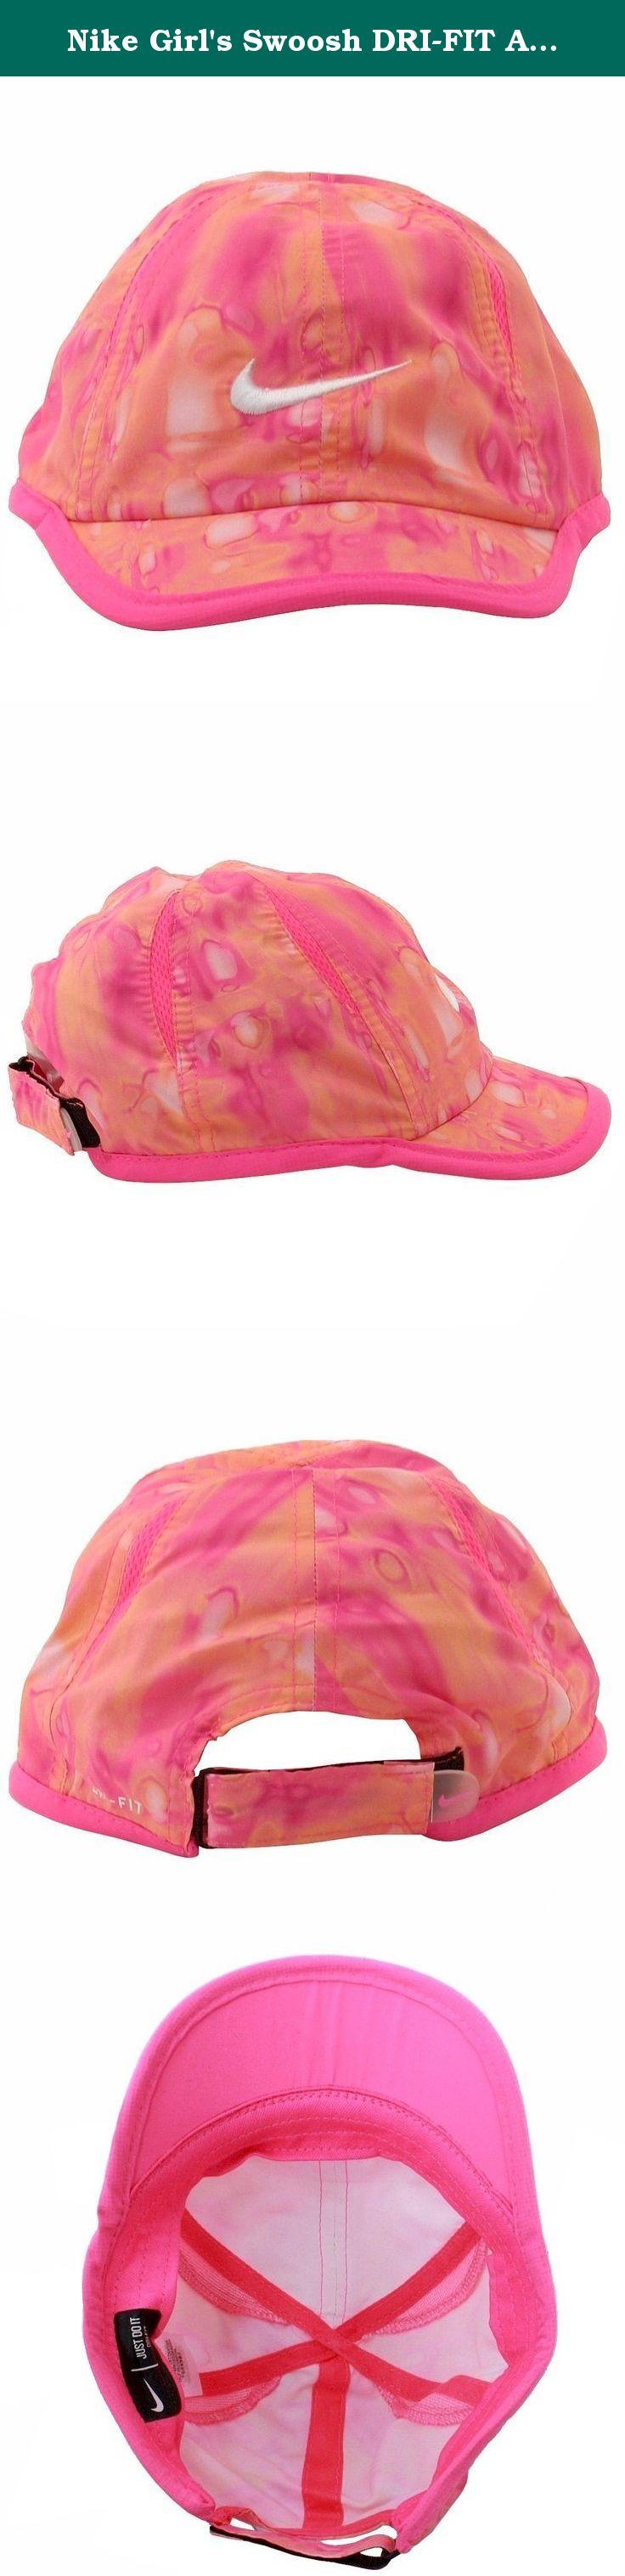 29a3ed1fd Nike Girl's Swoosh DRI-FIT Adjustable Baseball Cap 4/6X Lava Glow ...